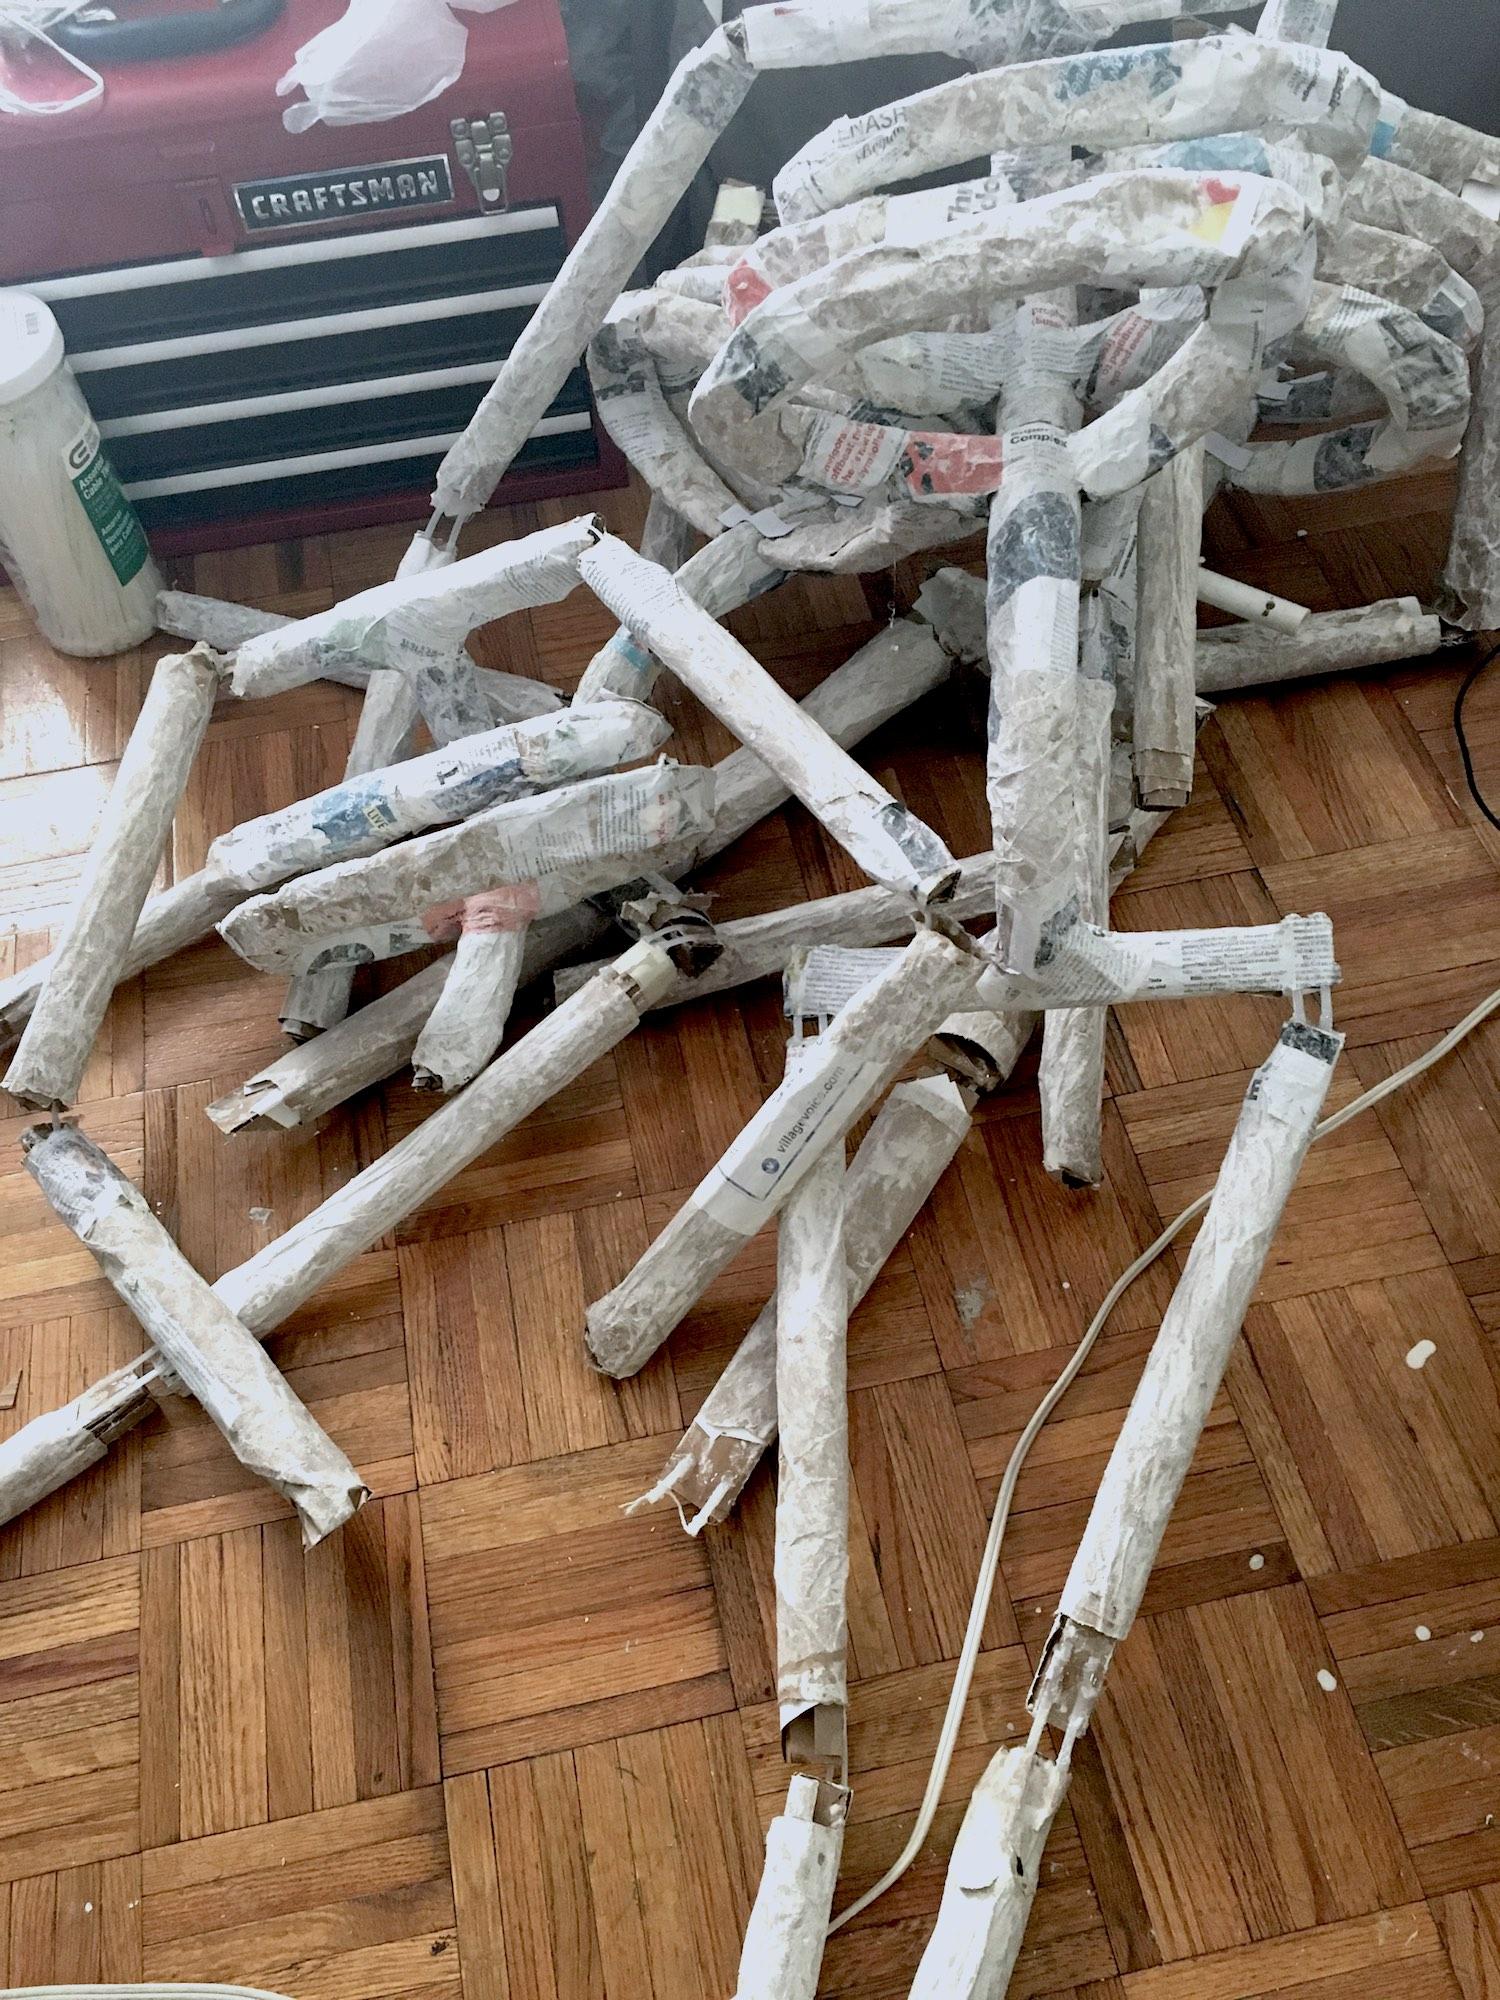 Pile O' Bones